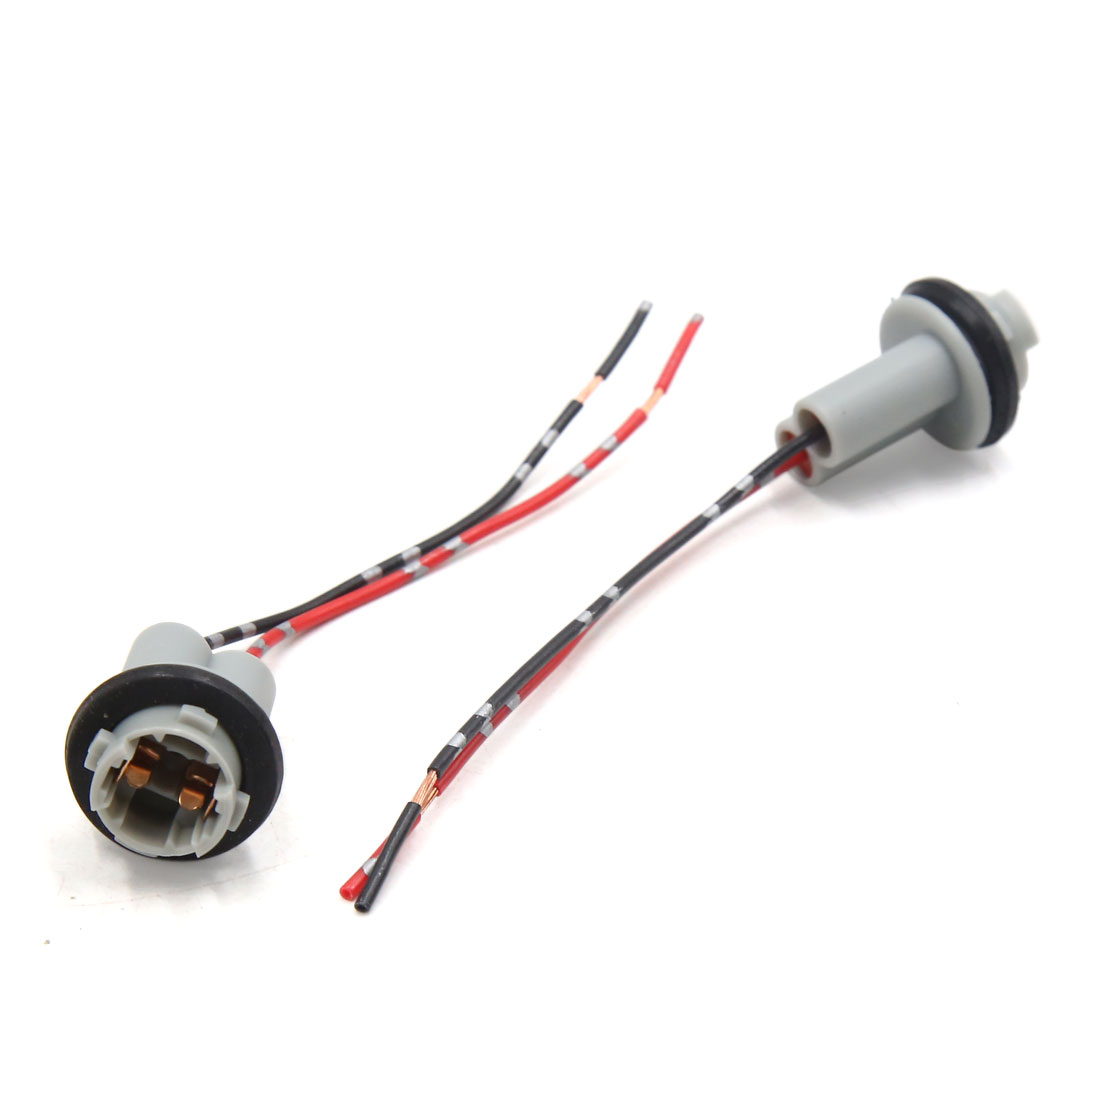 Car Truck Light Lamp T10 Socket Holder Extension Wiring Harness Lite Connector 6pcs